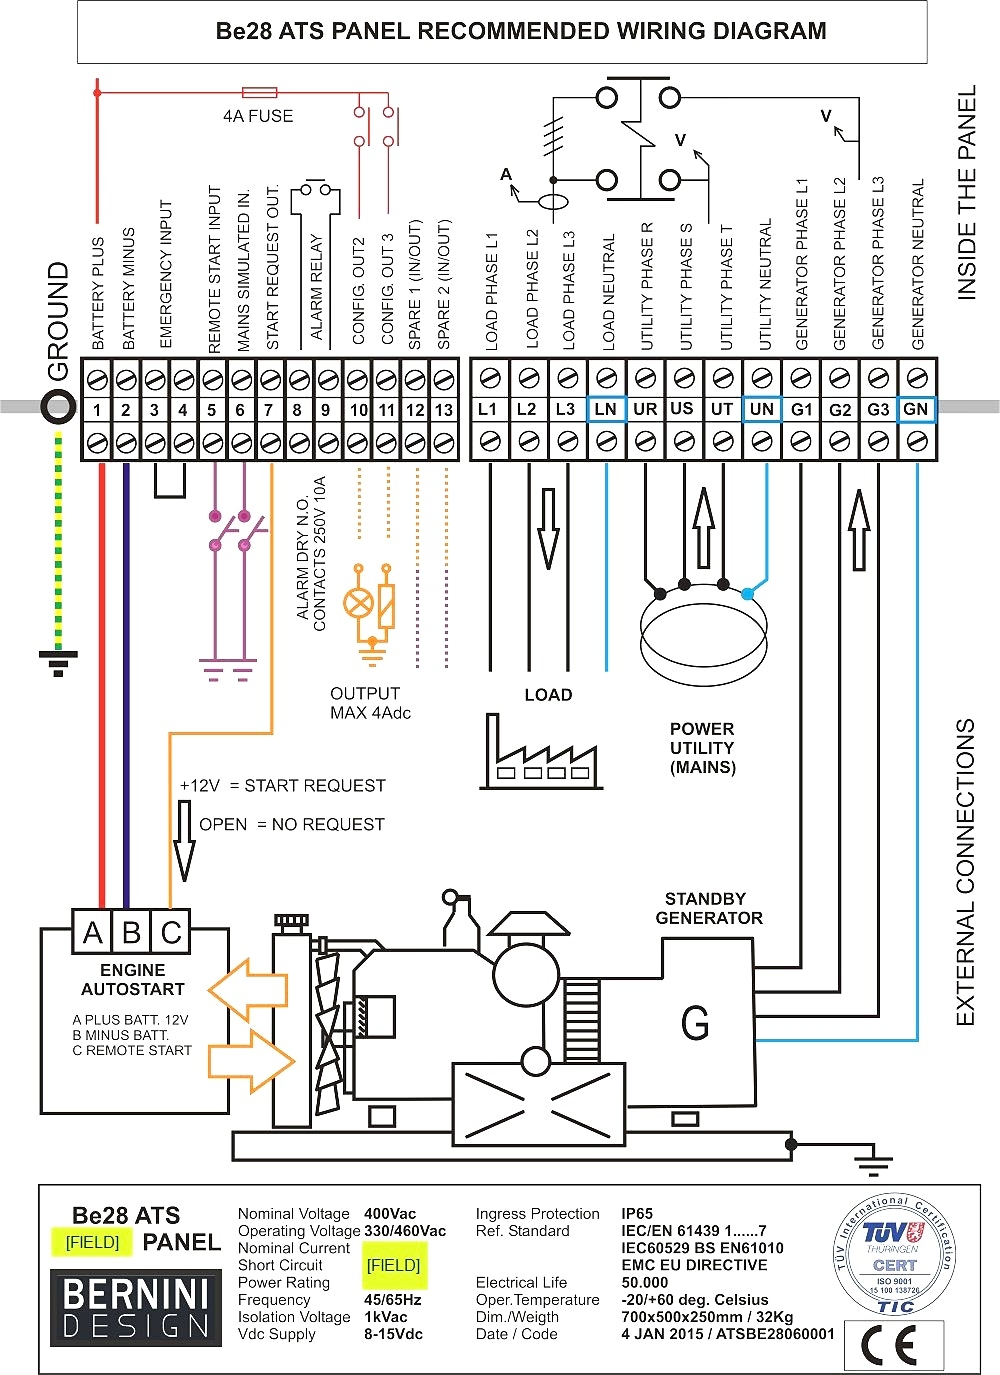 Manual Transfer Switch Wiring Diagram